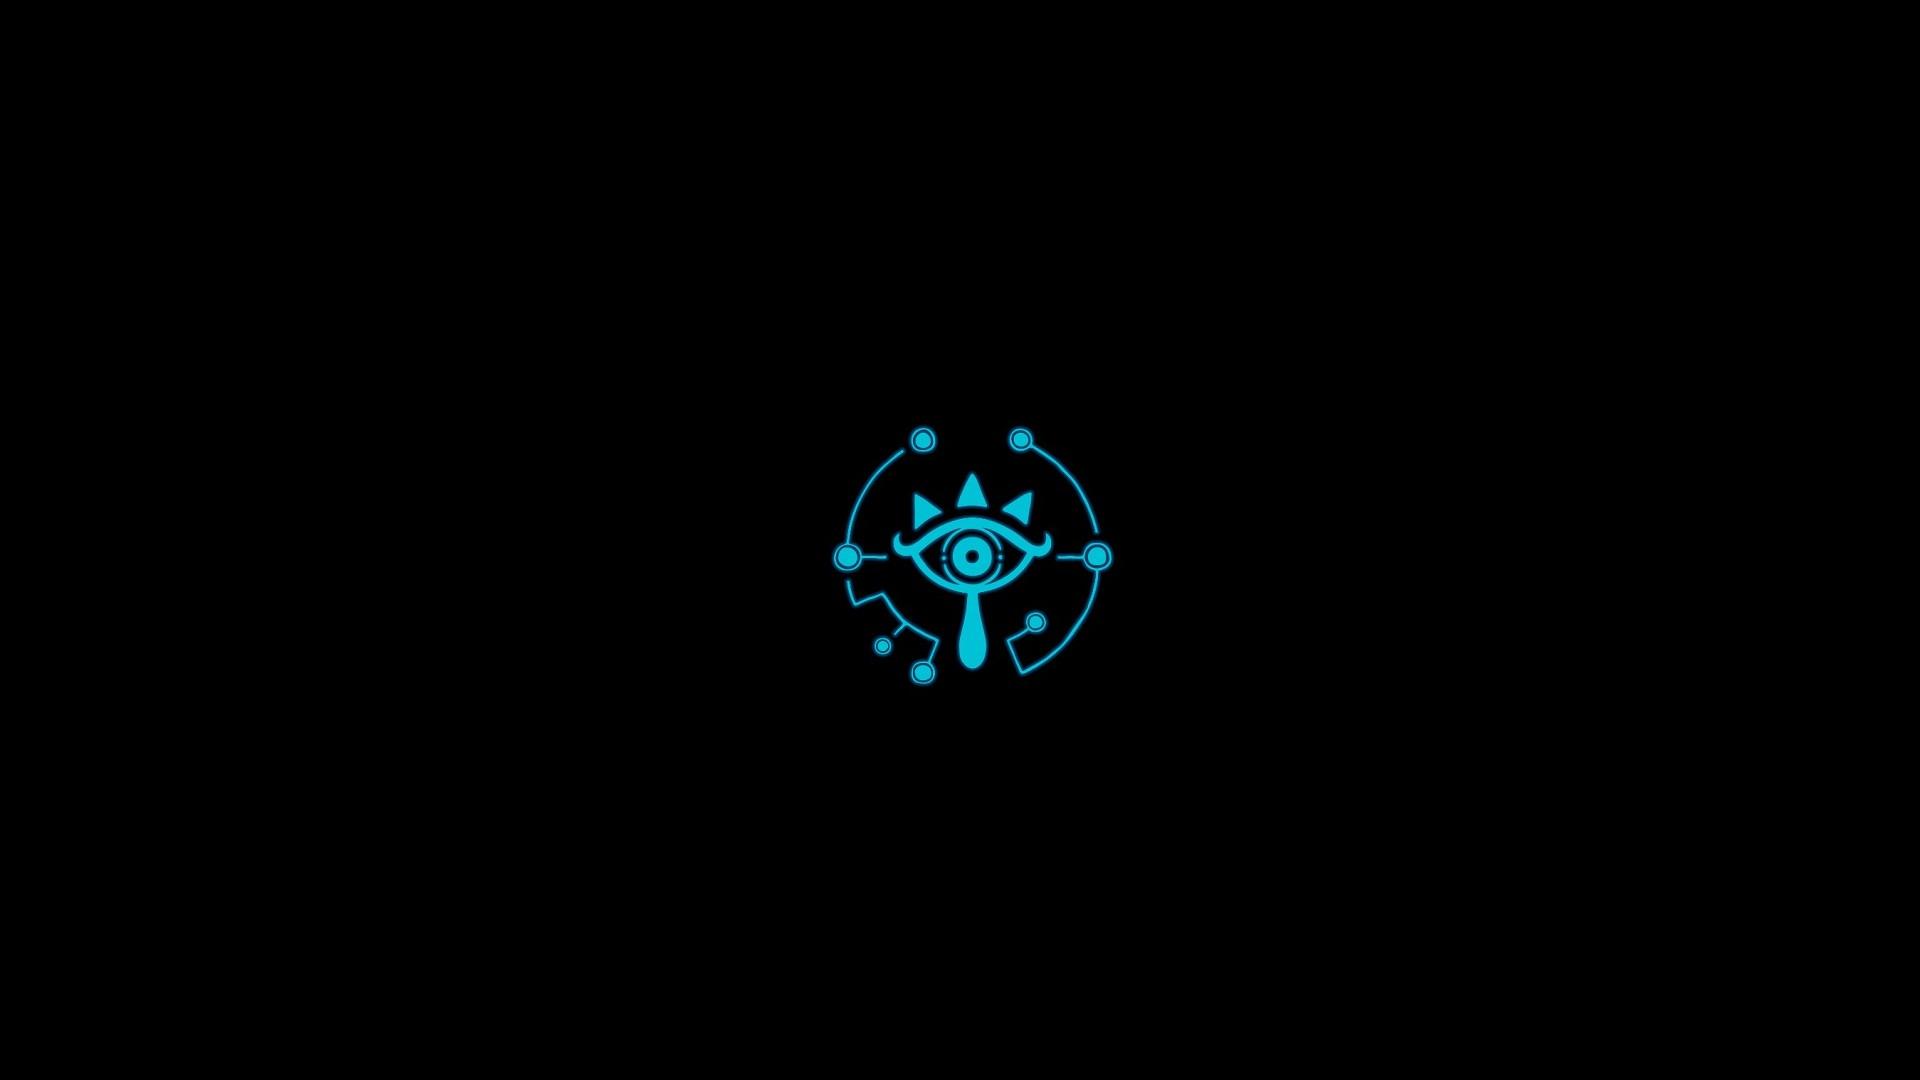 The Legend Of Zelda Minimalism Video Games Cyan Centered